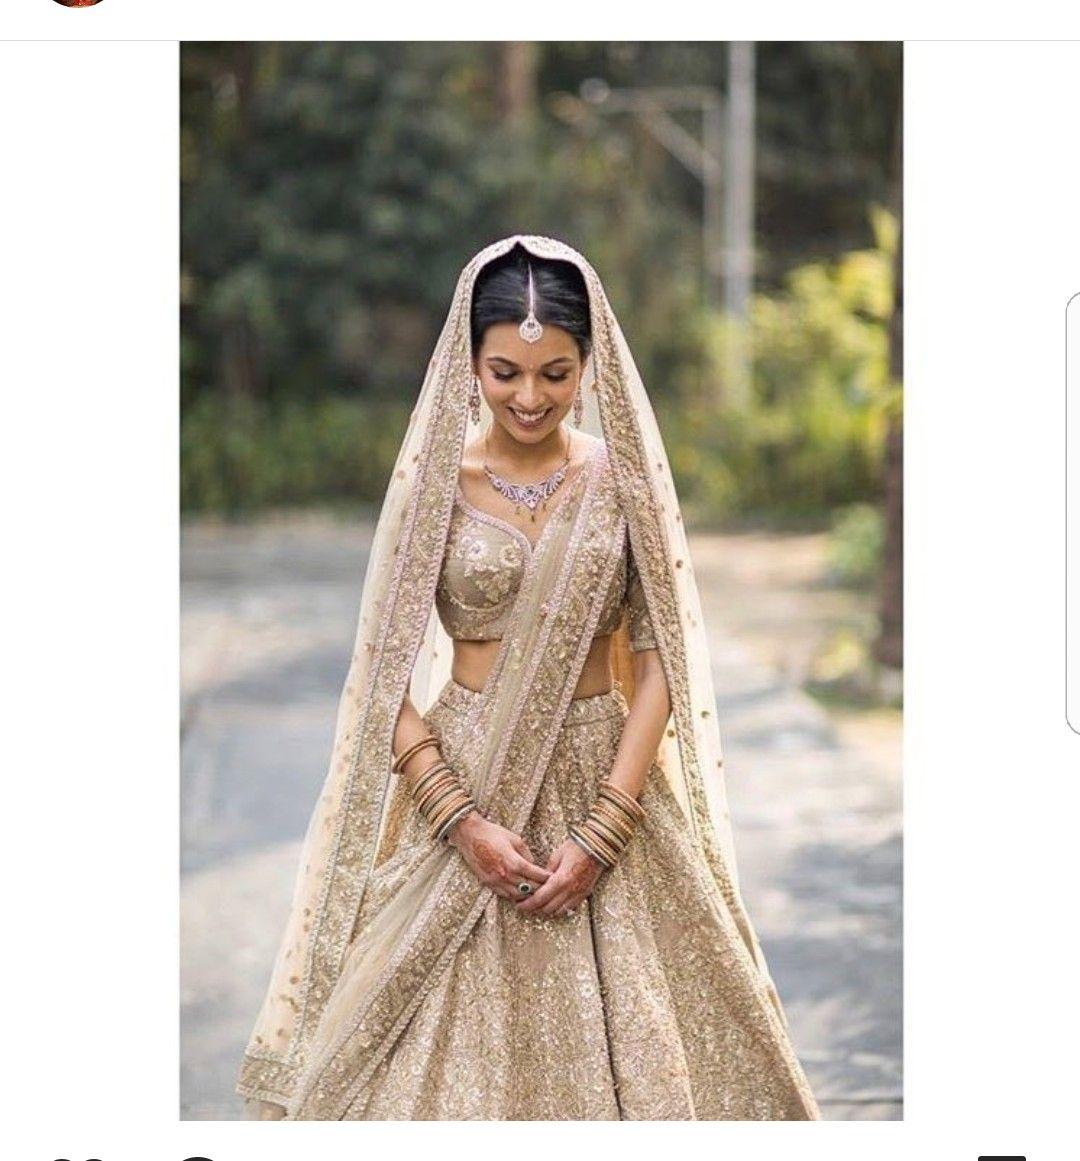 Weddings Abroad Destination Weddings Weddings In Tenerife Wedding Planner Wedding Inspiratio Indian Bridal Outfits Indian Bridal Wear Indian Bridal Dress